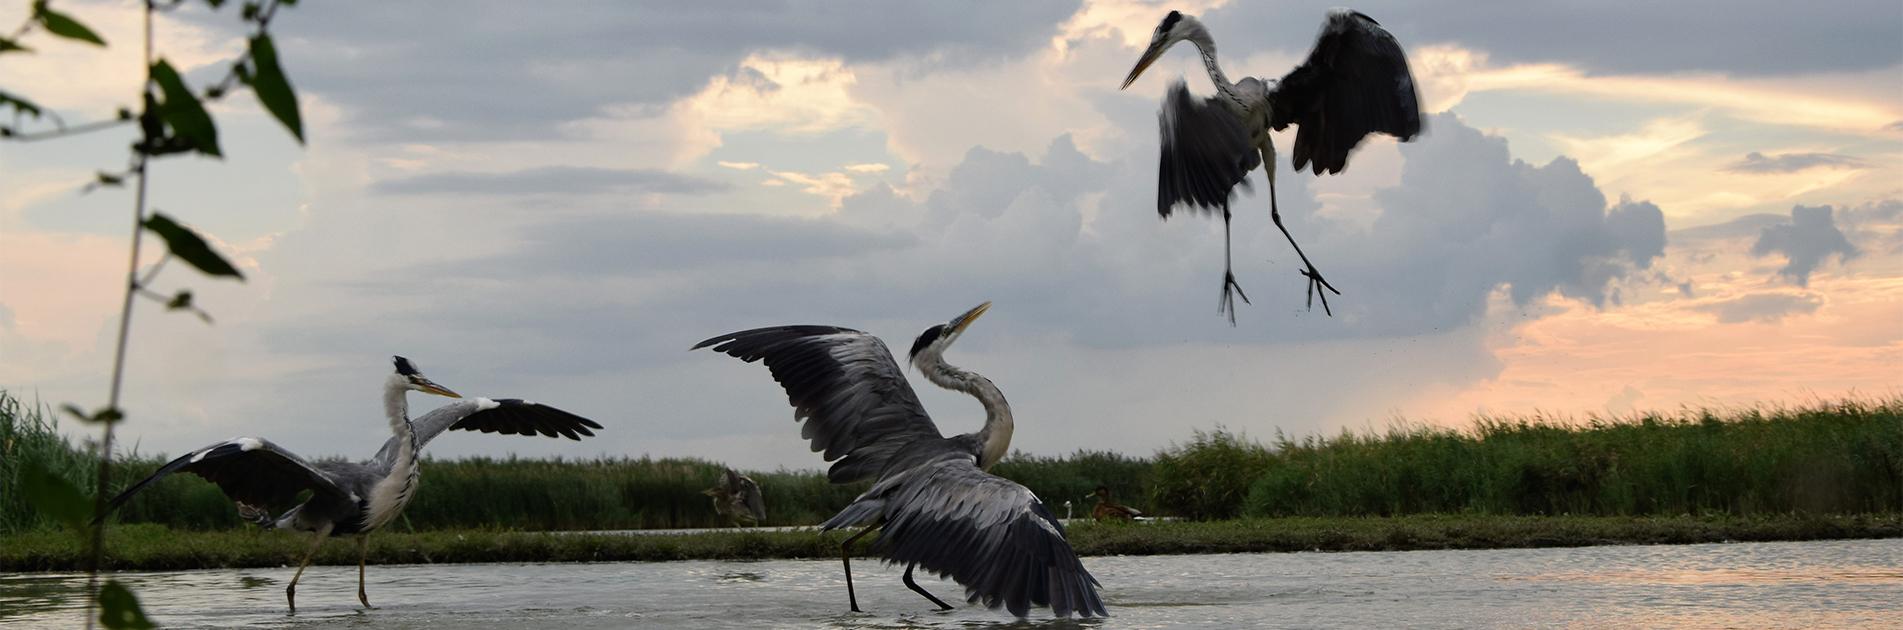 Fåglar i Ungern